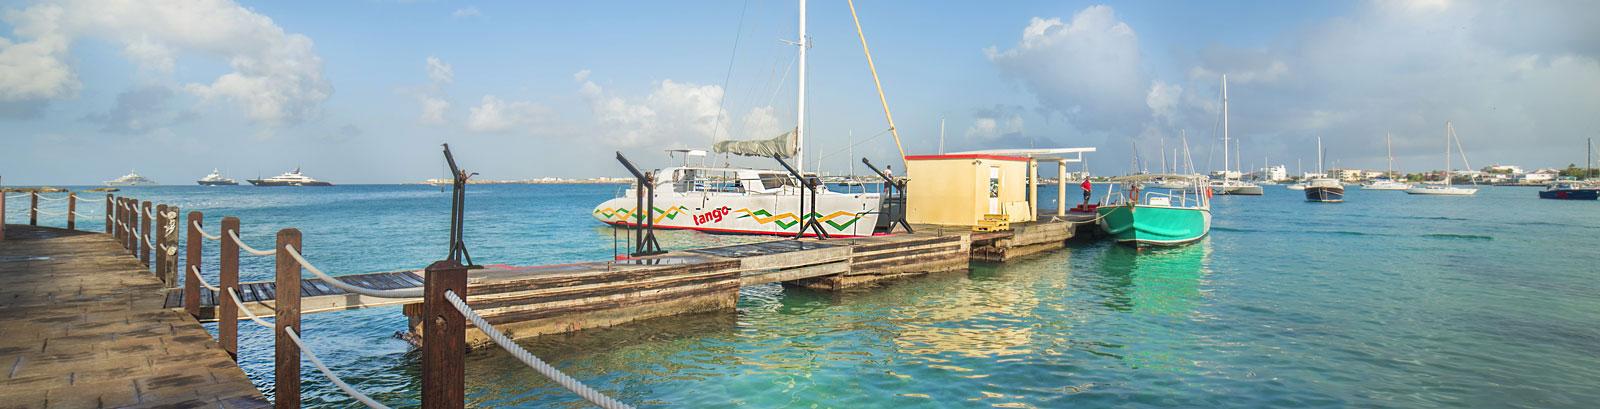 Une semaine de plaisir avec Aqua Mania à Saint-Martin